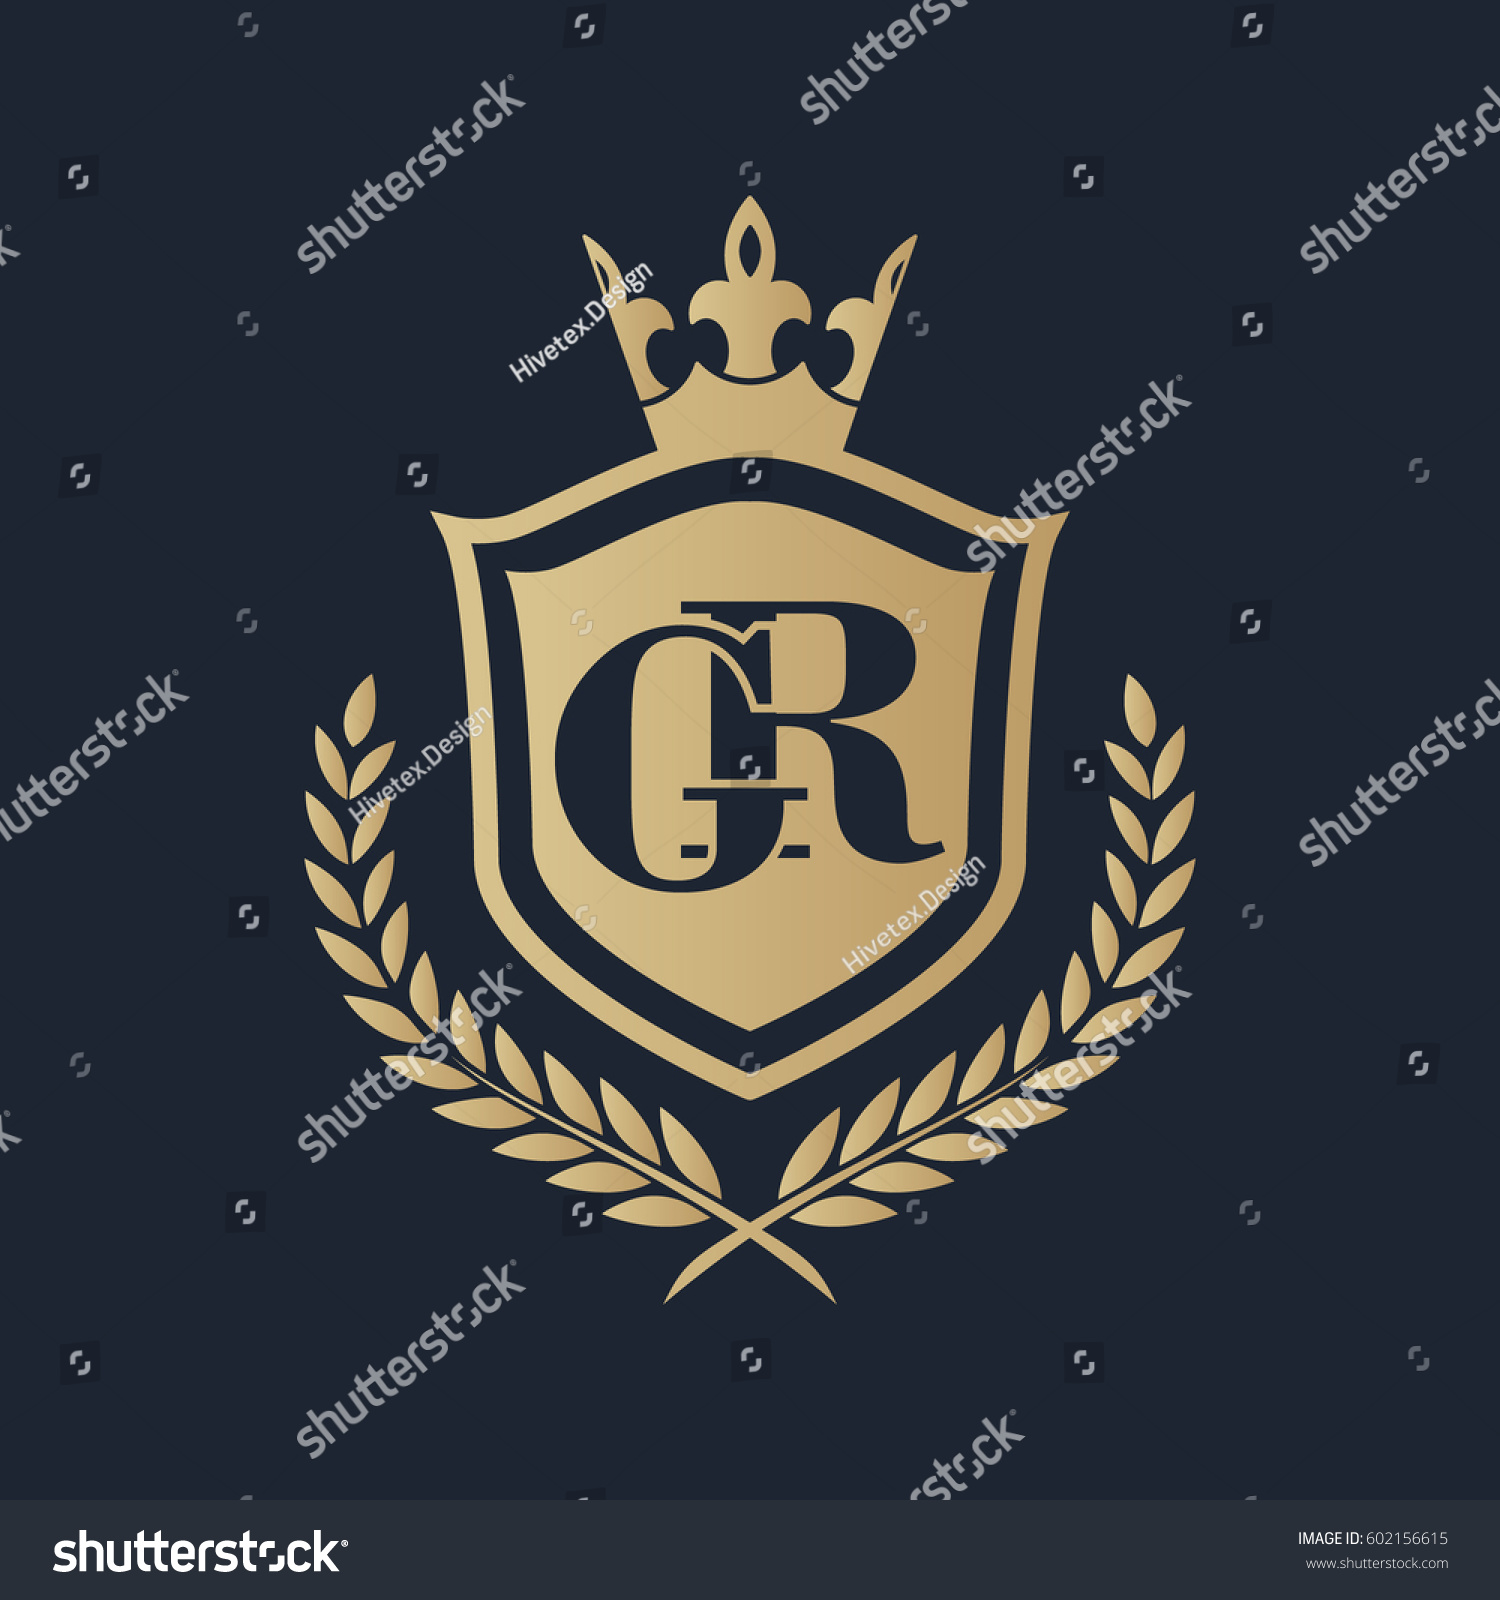 559cdbcaf8f9 GR Logo Stock Vector (Royalty Free) 602156615 - Shutterstock